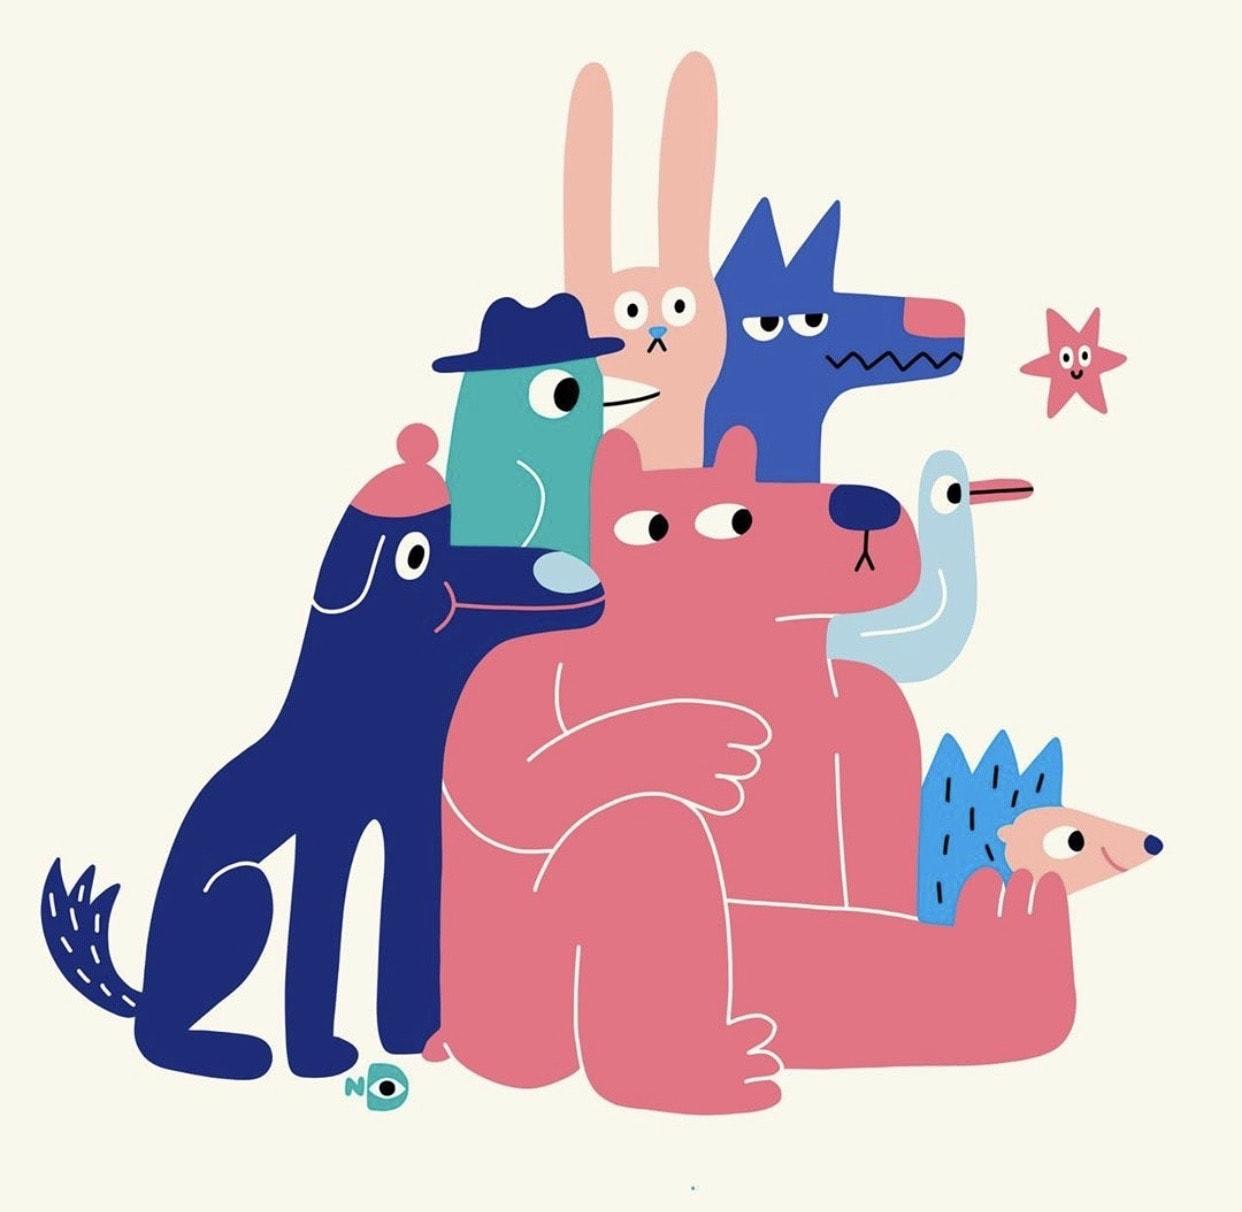 Illustrations of cute animals by Nina Dzyvulska